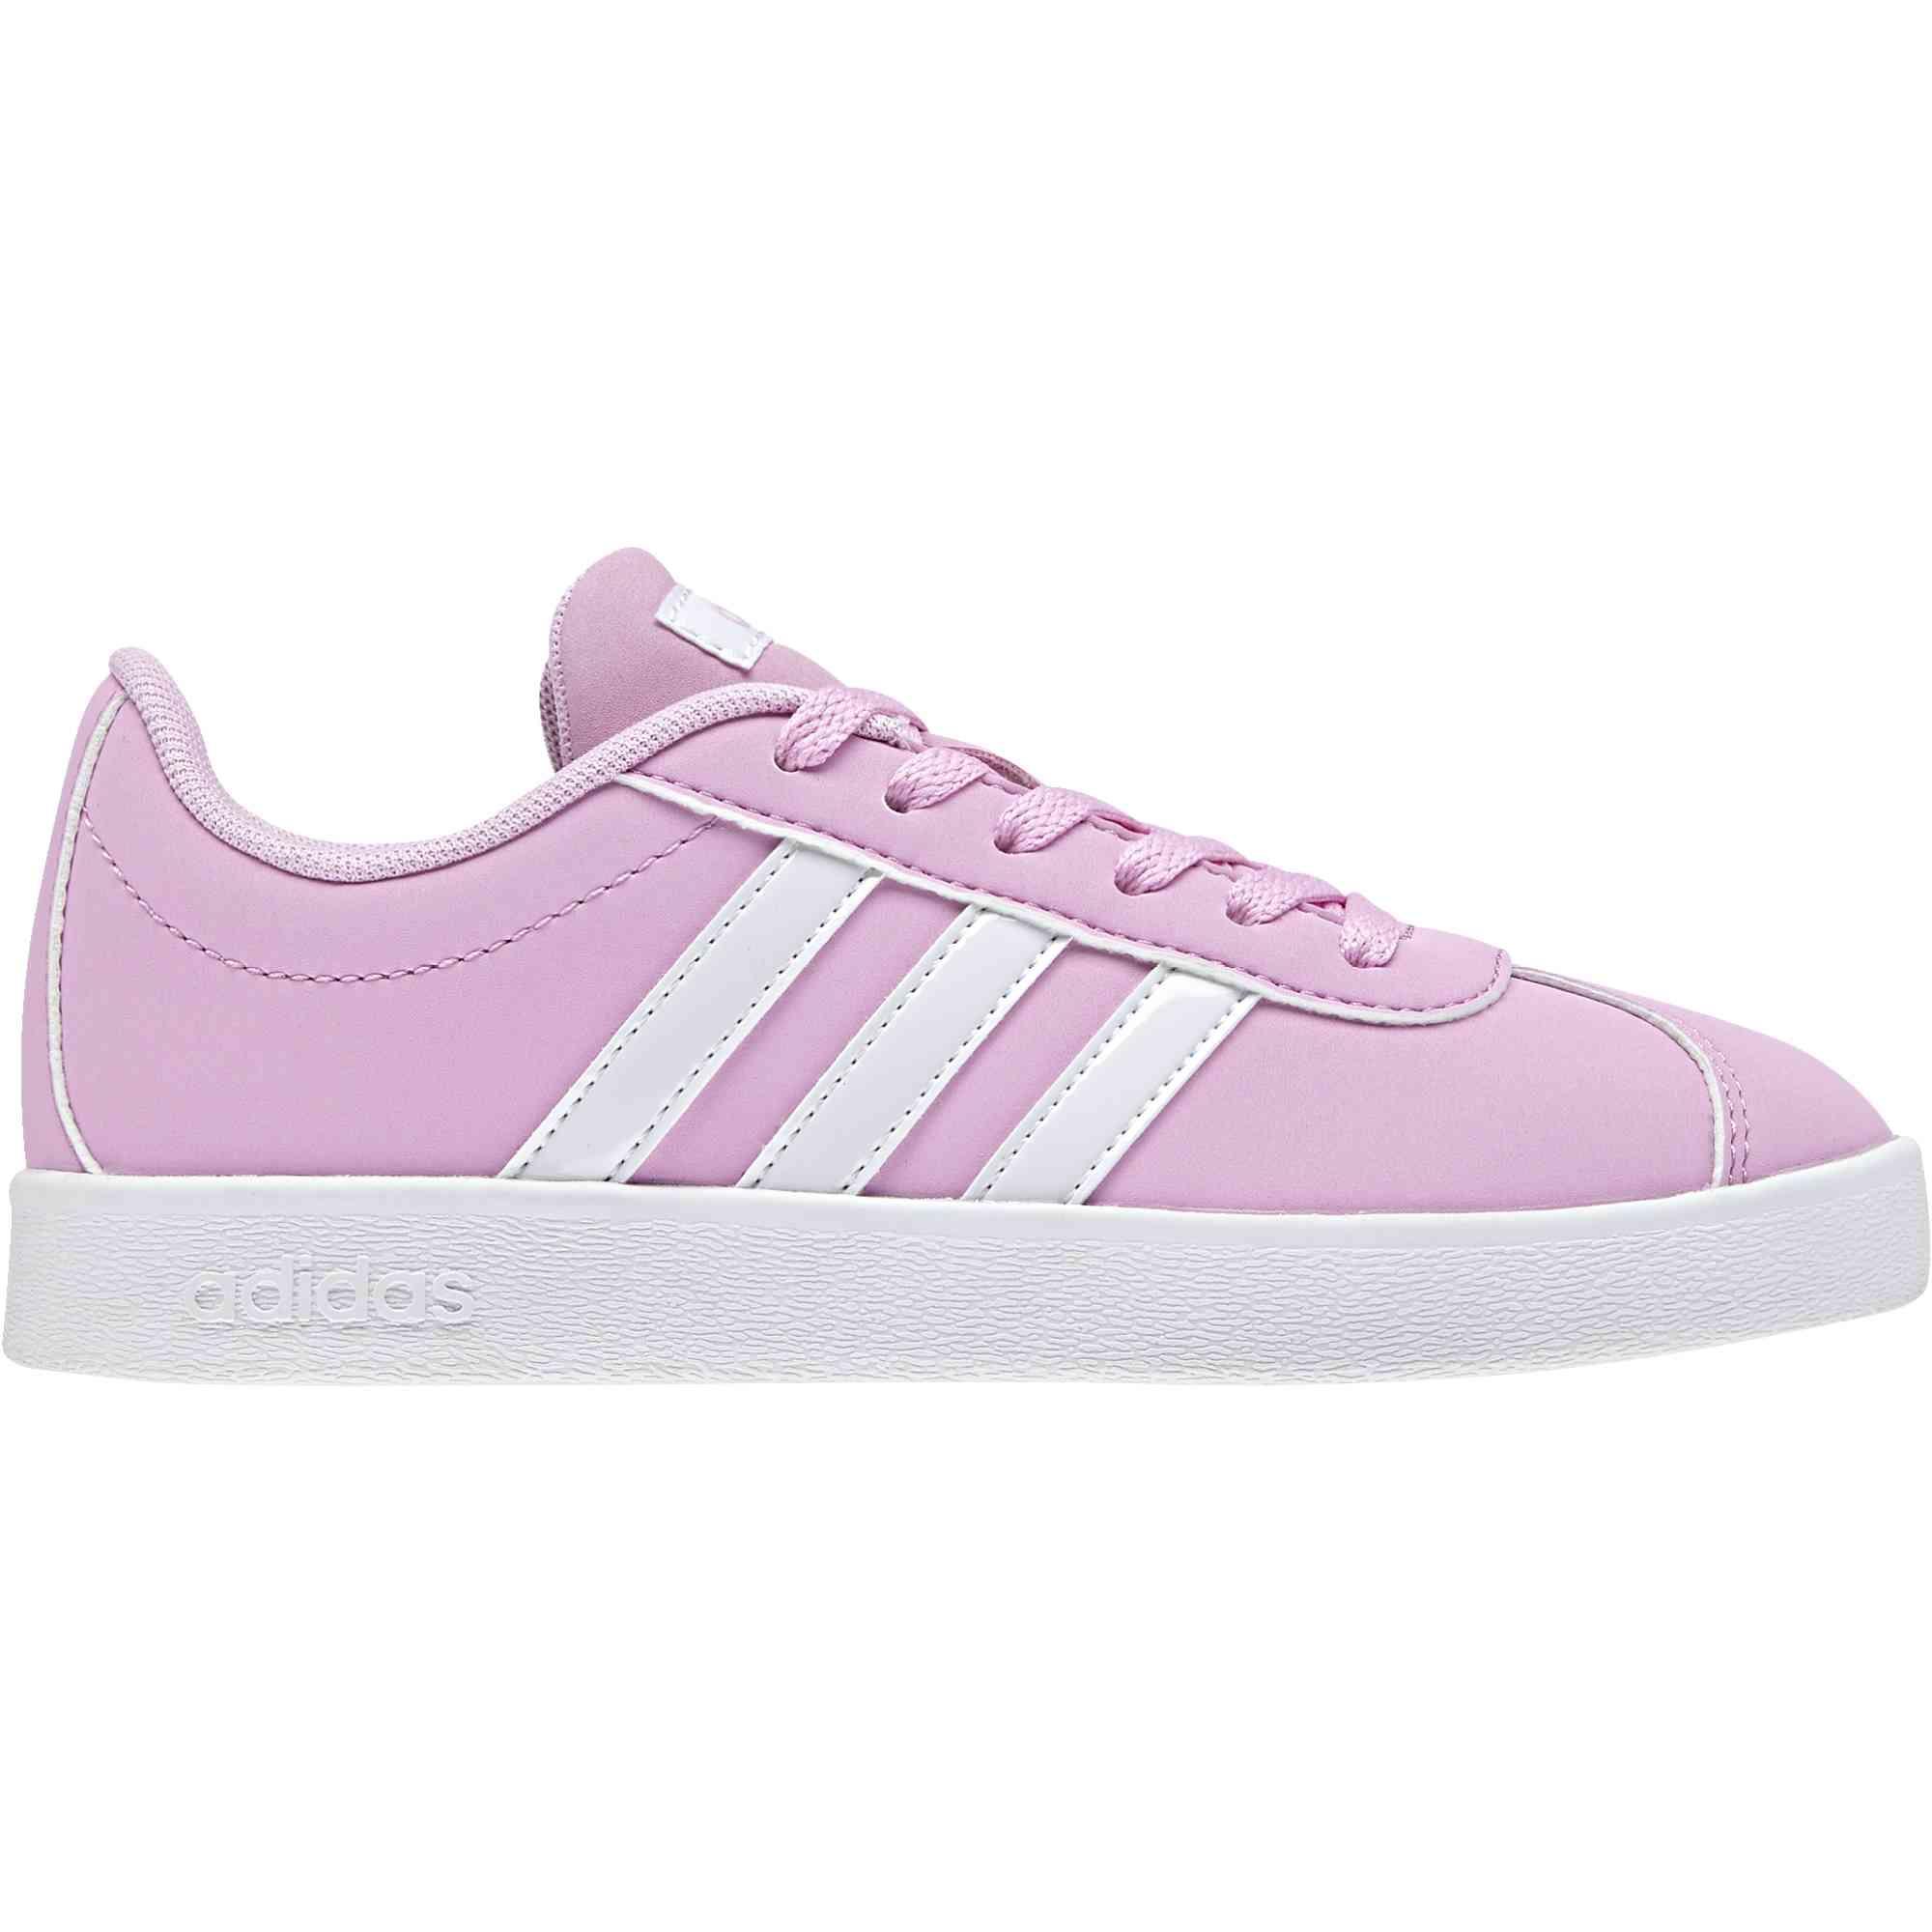 Adidas Vulc Court 2 Meisjes schoenen